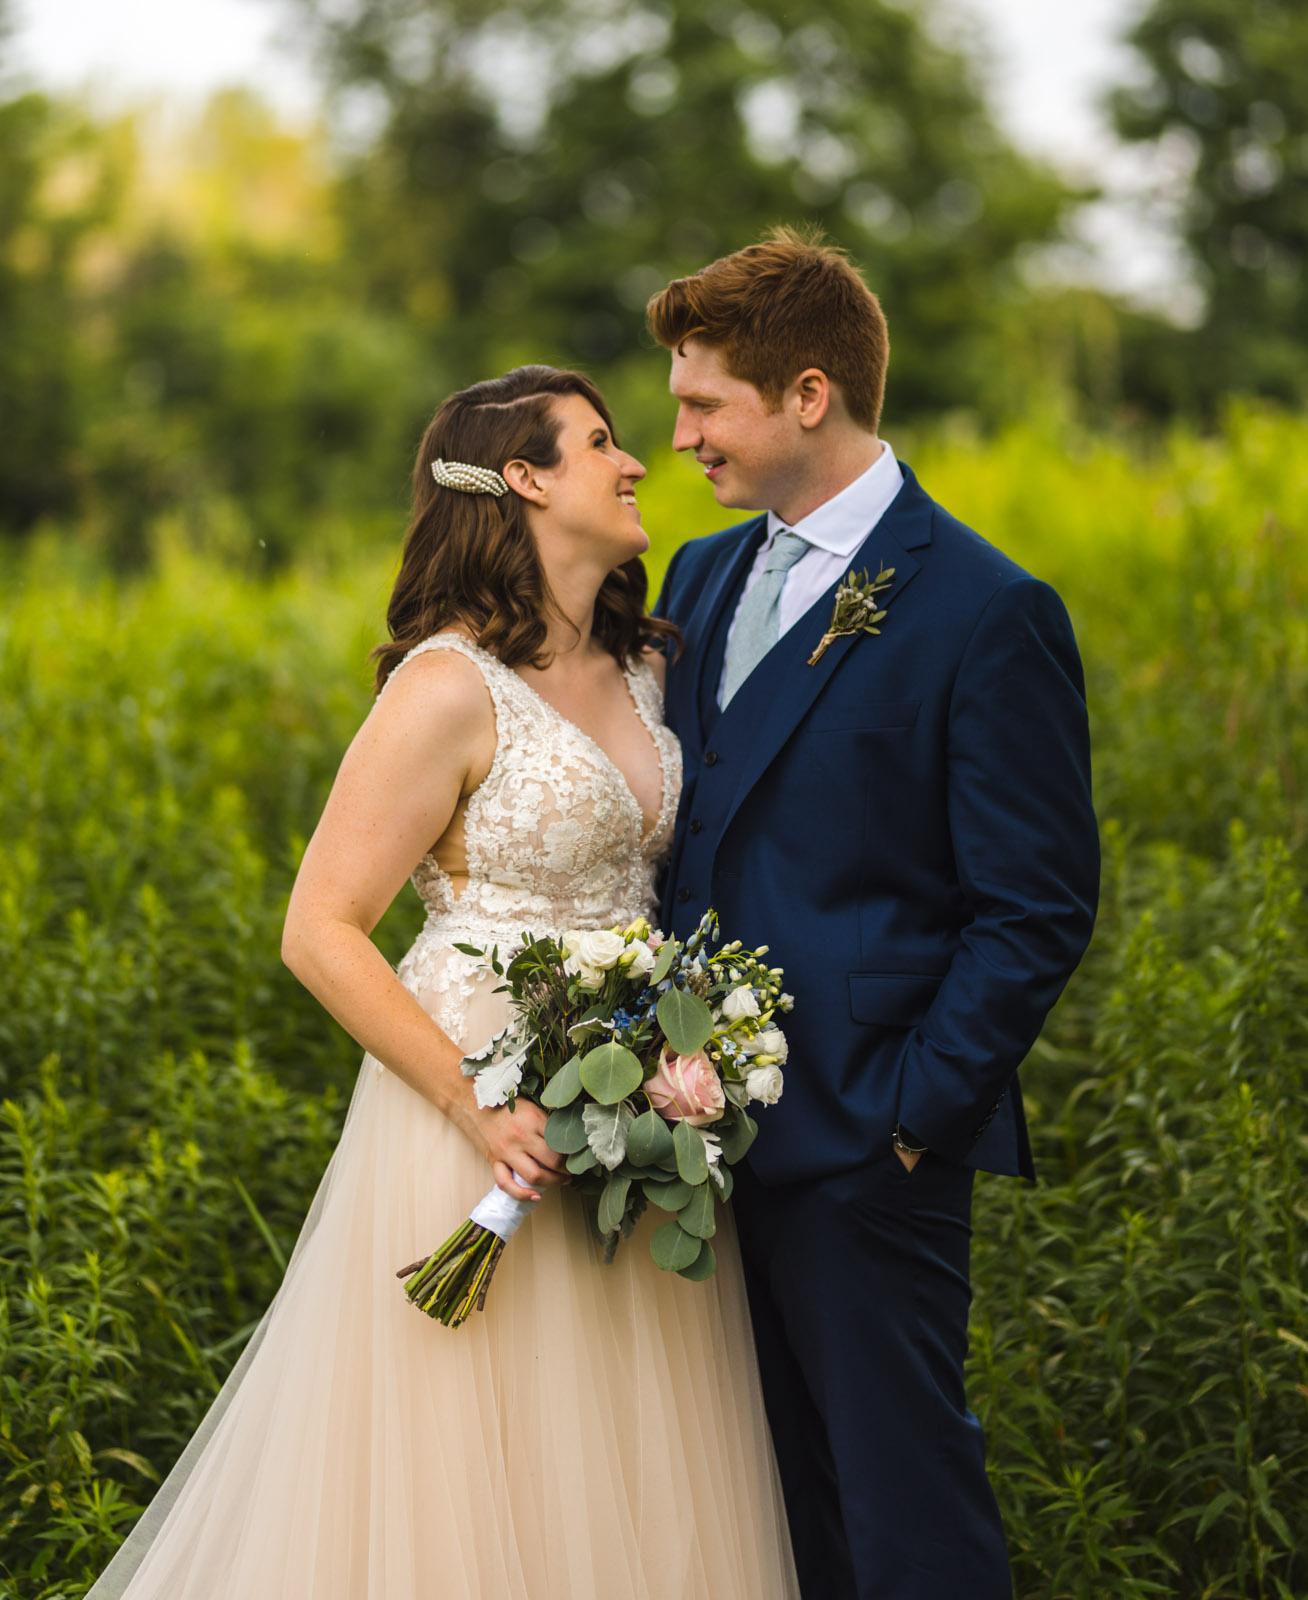 Emerson & Elicia's Golf Course Wedding Aidan & Leanne Hennebry Hamilton Wedding Videographers Photographers Niagara Hush Hush Photography & Film-44.jpg